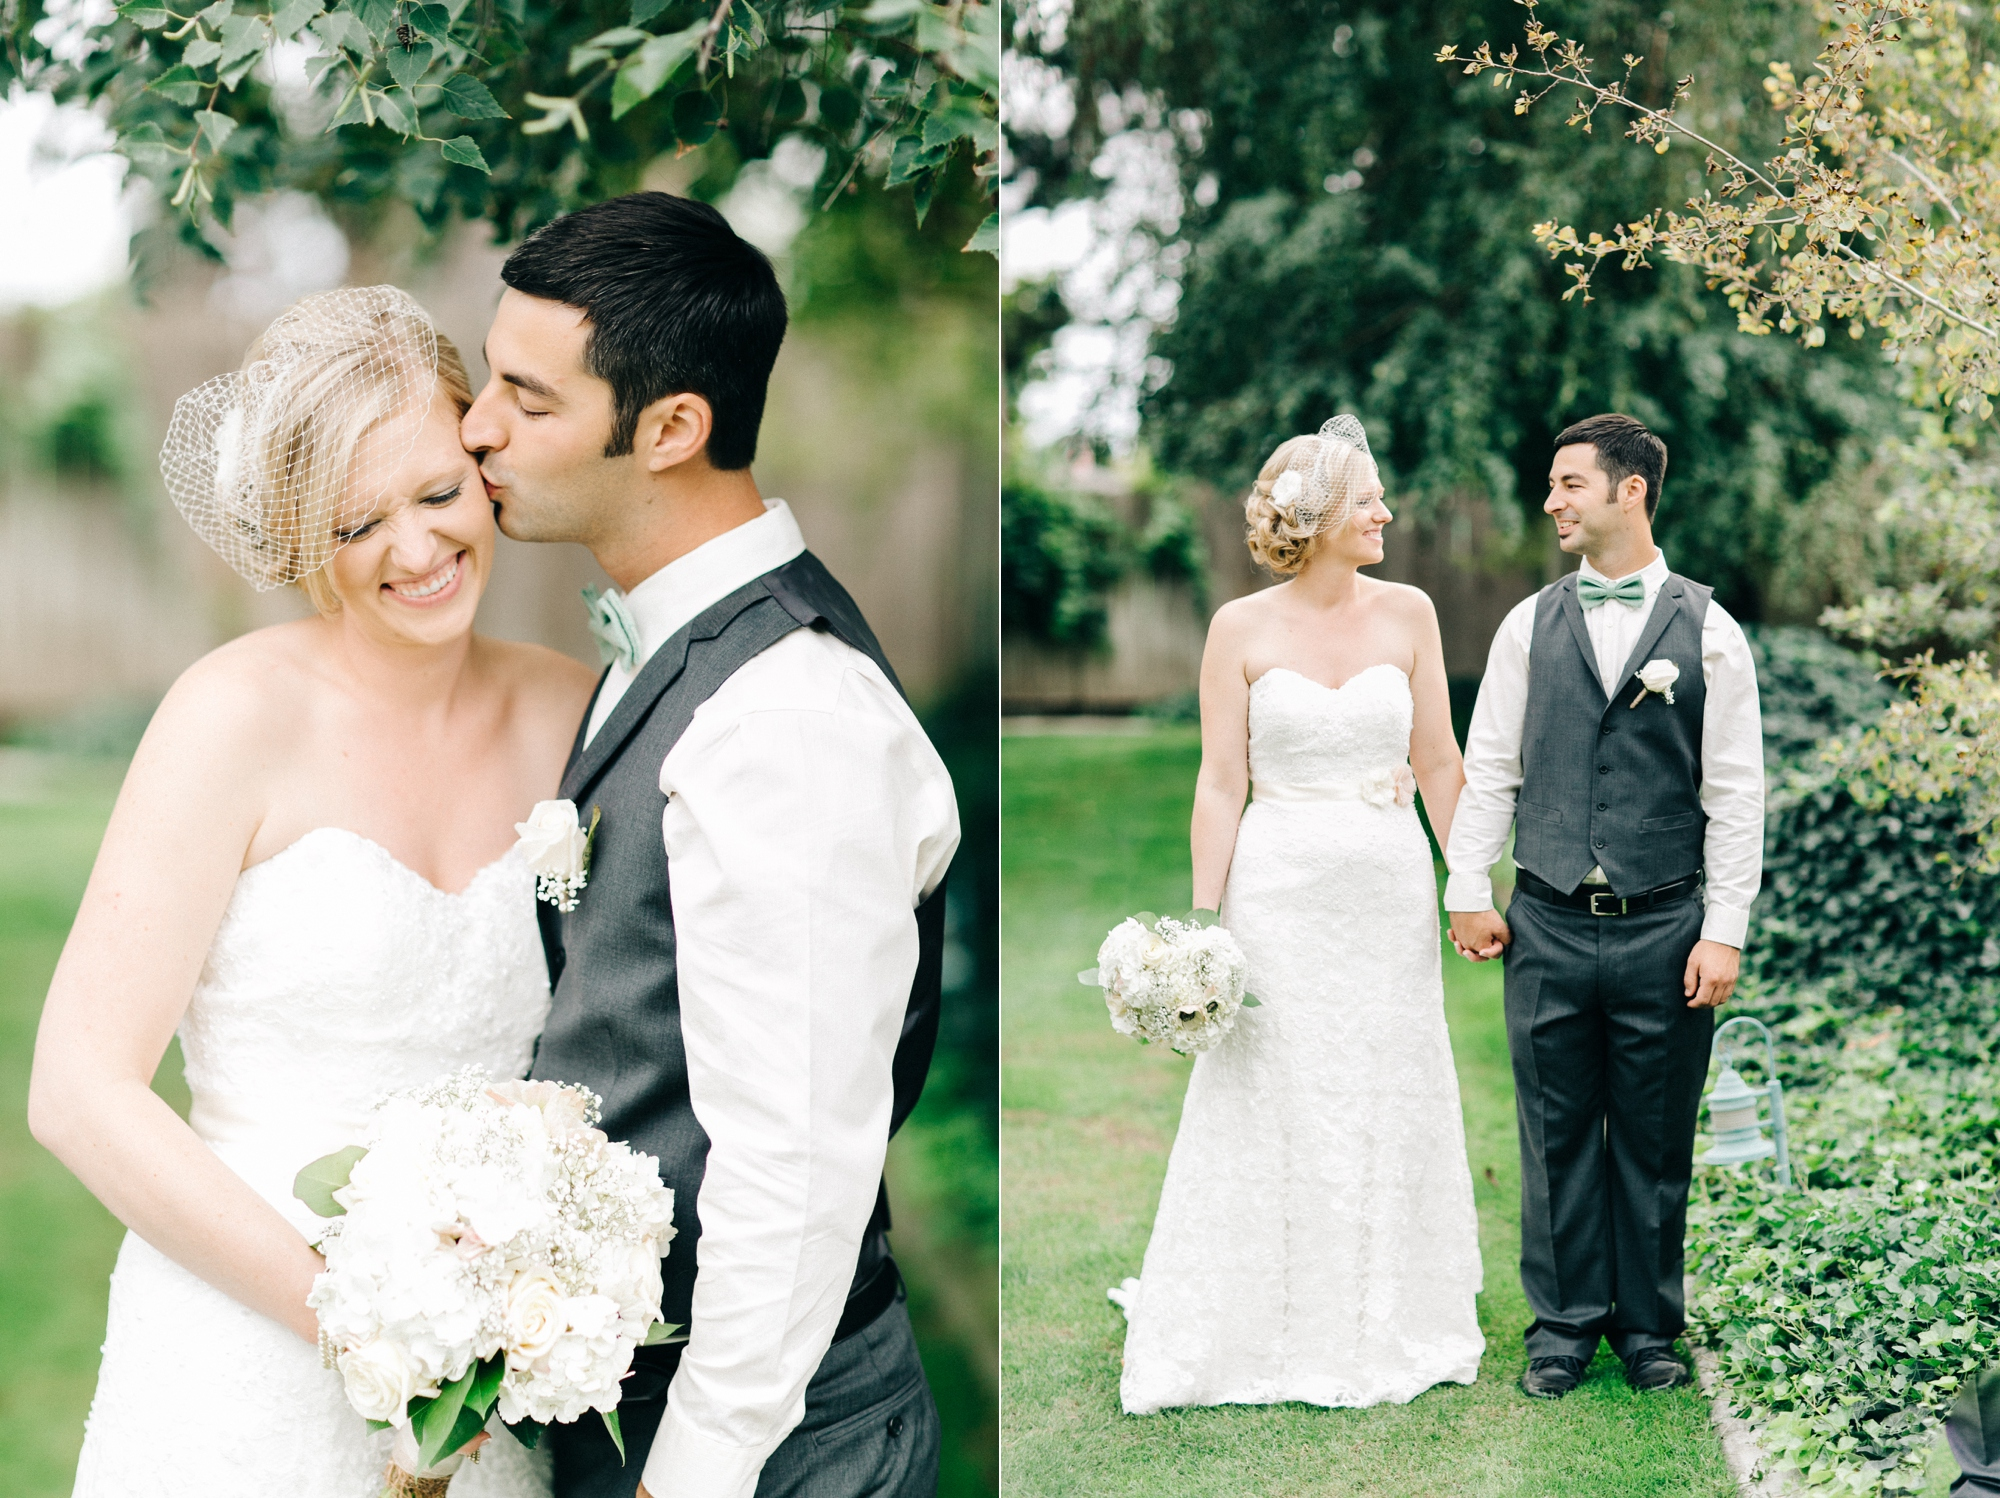 09_Backyard_Pasco_Washington_Wedding_Photo.JPG